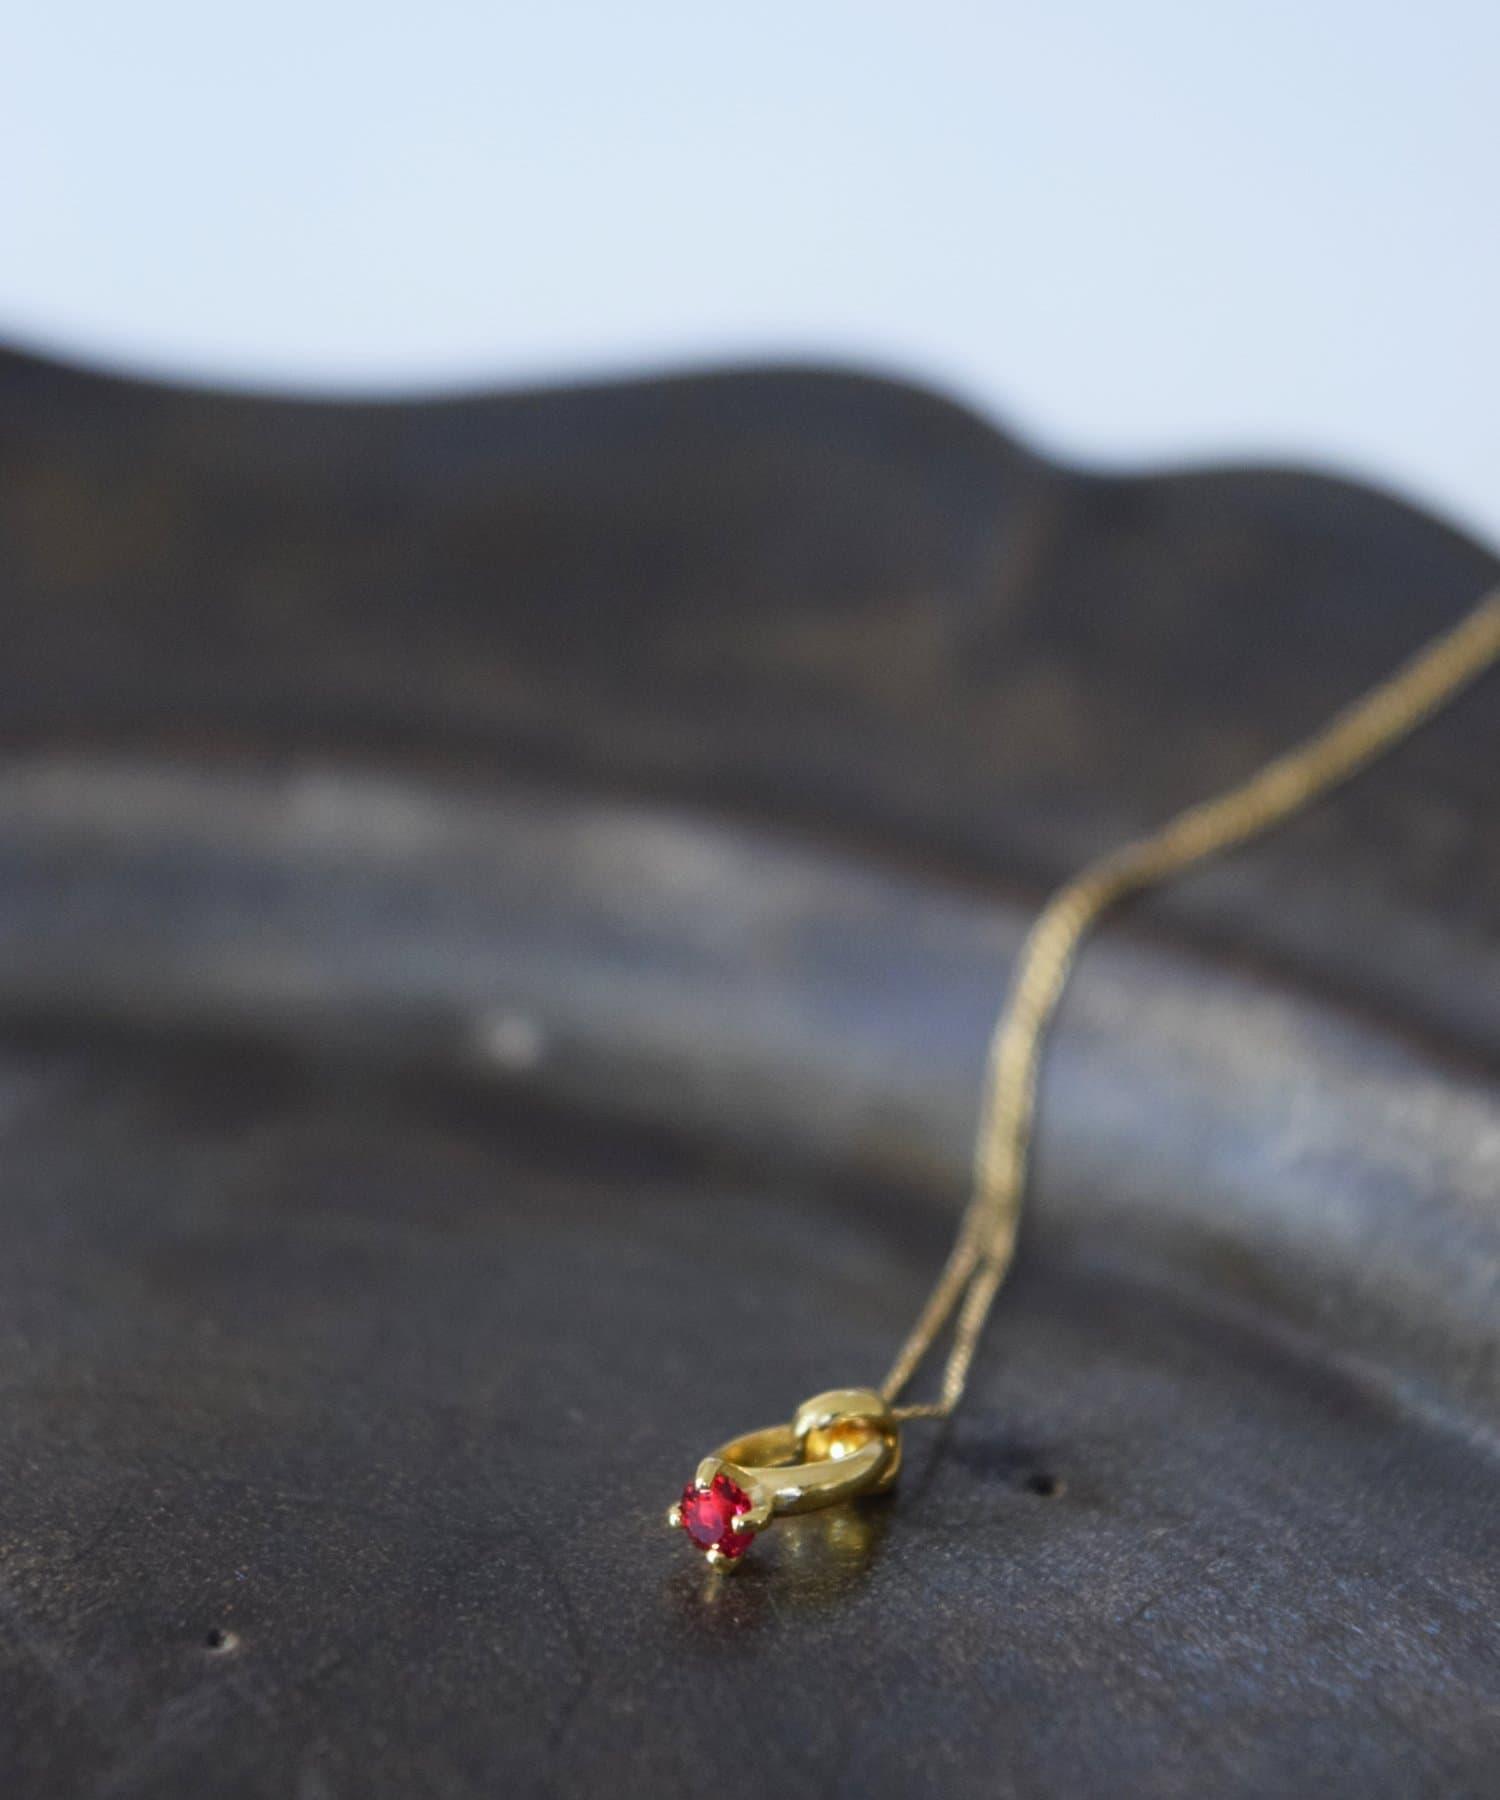 BIRTHDAY BAR(バースデイバー) レディース Birthstone Petit Ring Necklace 誕生石ネックレス ピンク